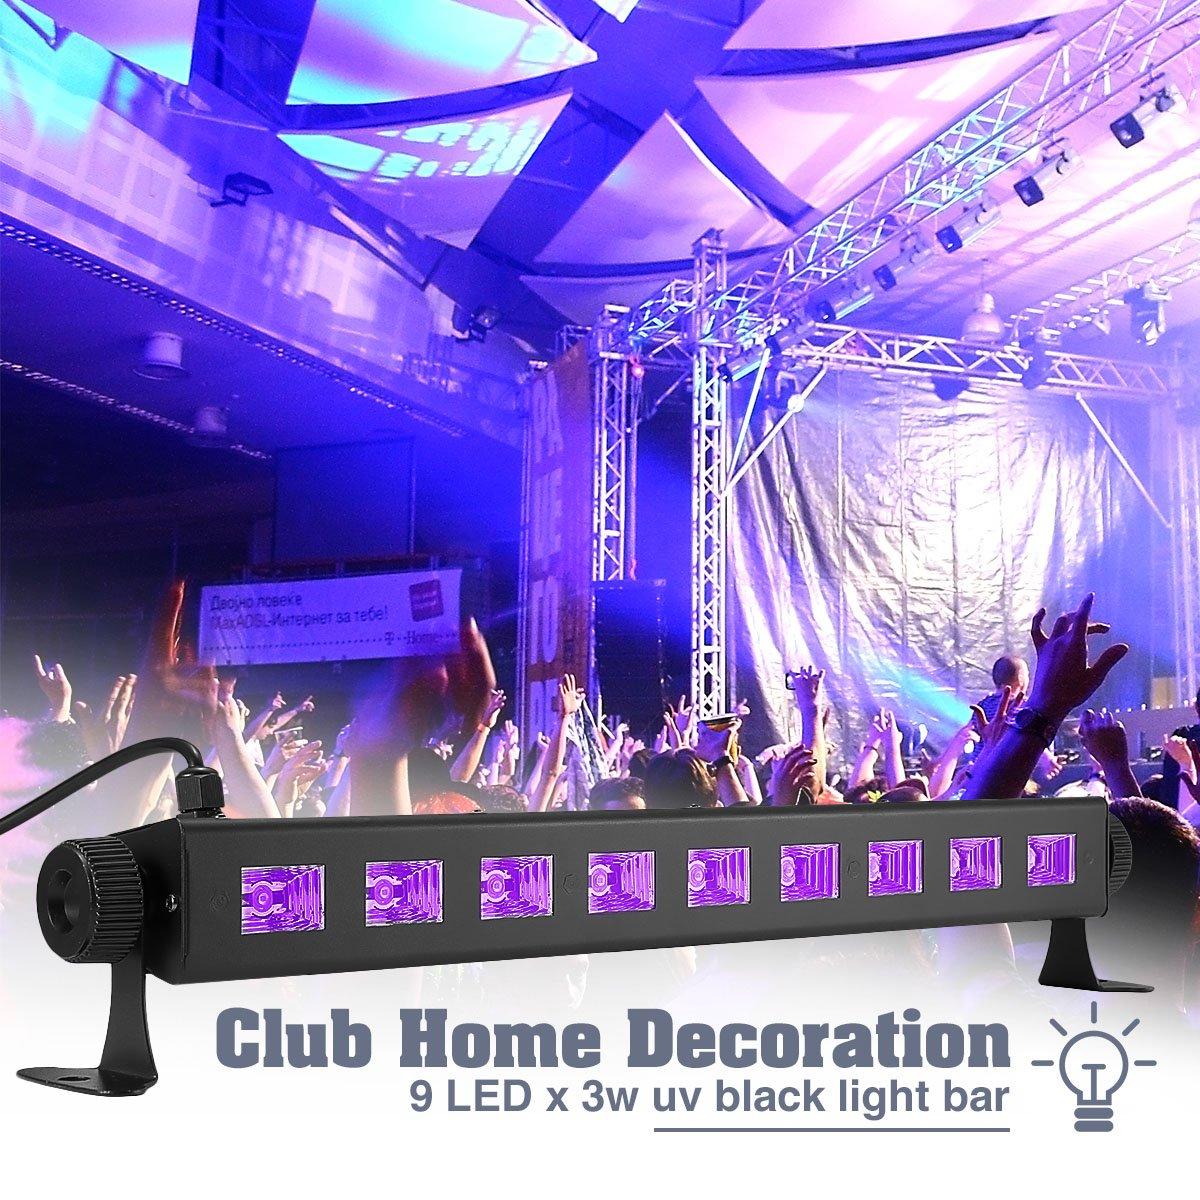 UV Disco Lights, Elfeland 27W 9LED UV LED Bar Black Light Fixture Wall Washer Metallic Blacklight Disco Light Stage Light for Glow Party UV BodyPaint Holiday Disco DJ Poster Tapestry